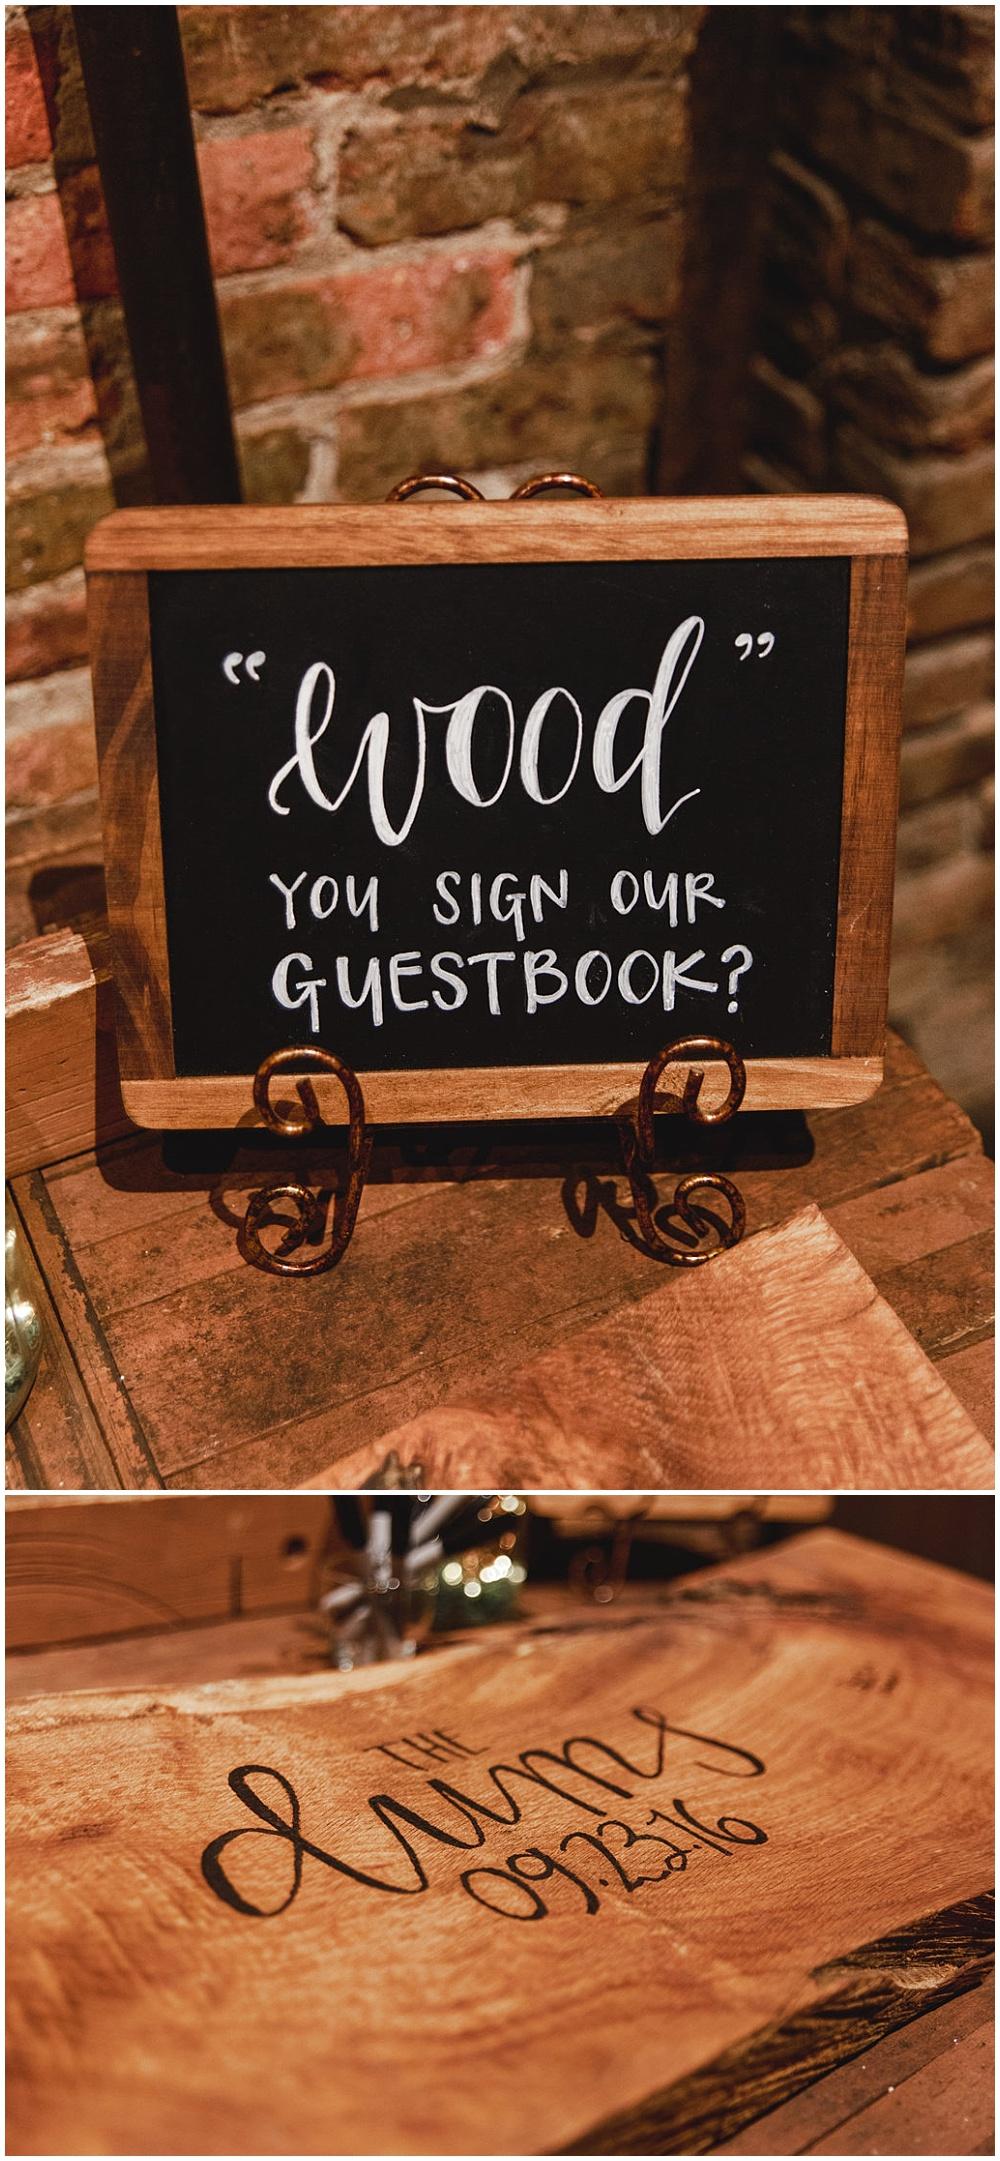 Personalized wood guestbook bench   Chicago urban rustic wedding   Sandra Armenteros Photography + Jessica Dum Wedding Coordination